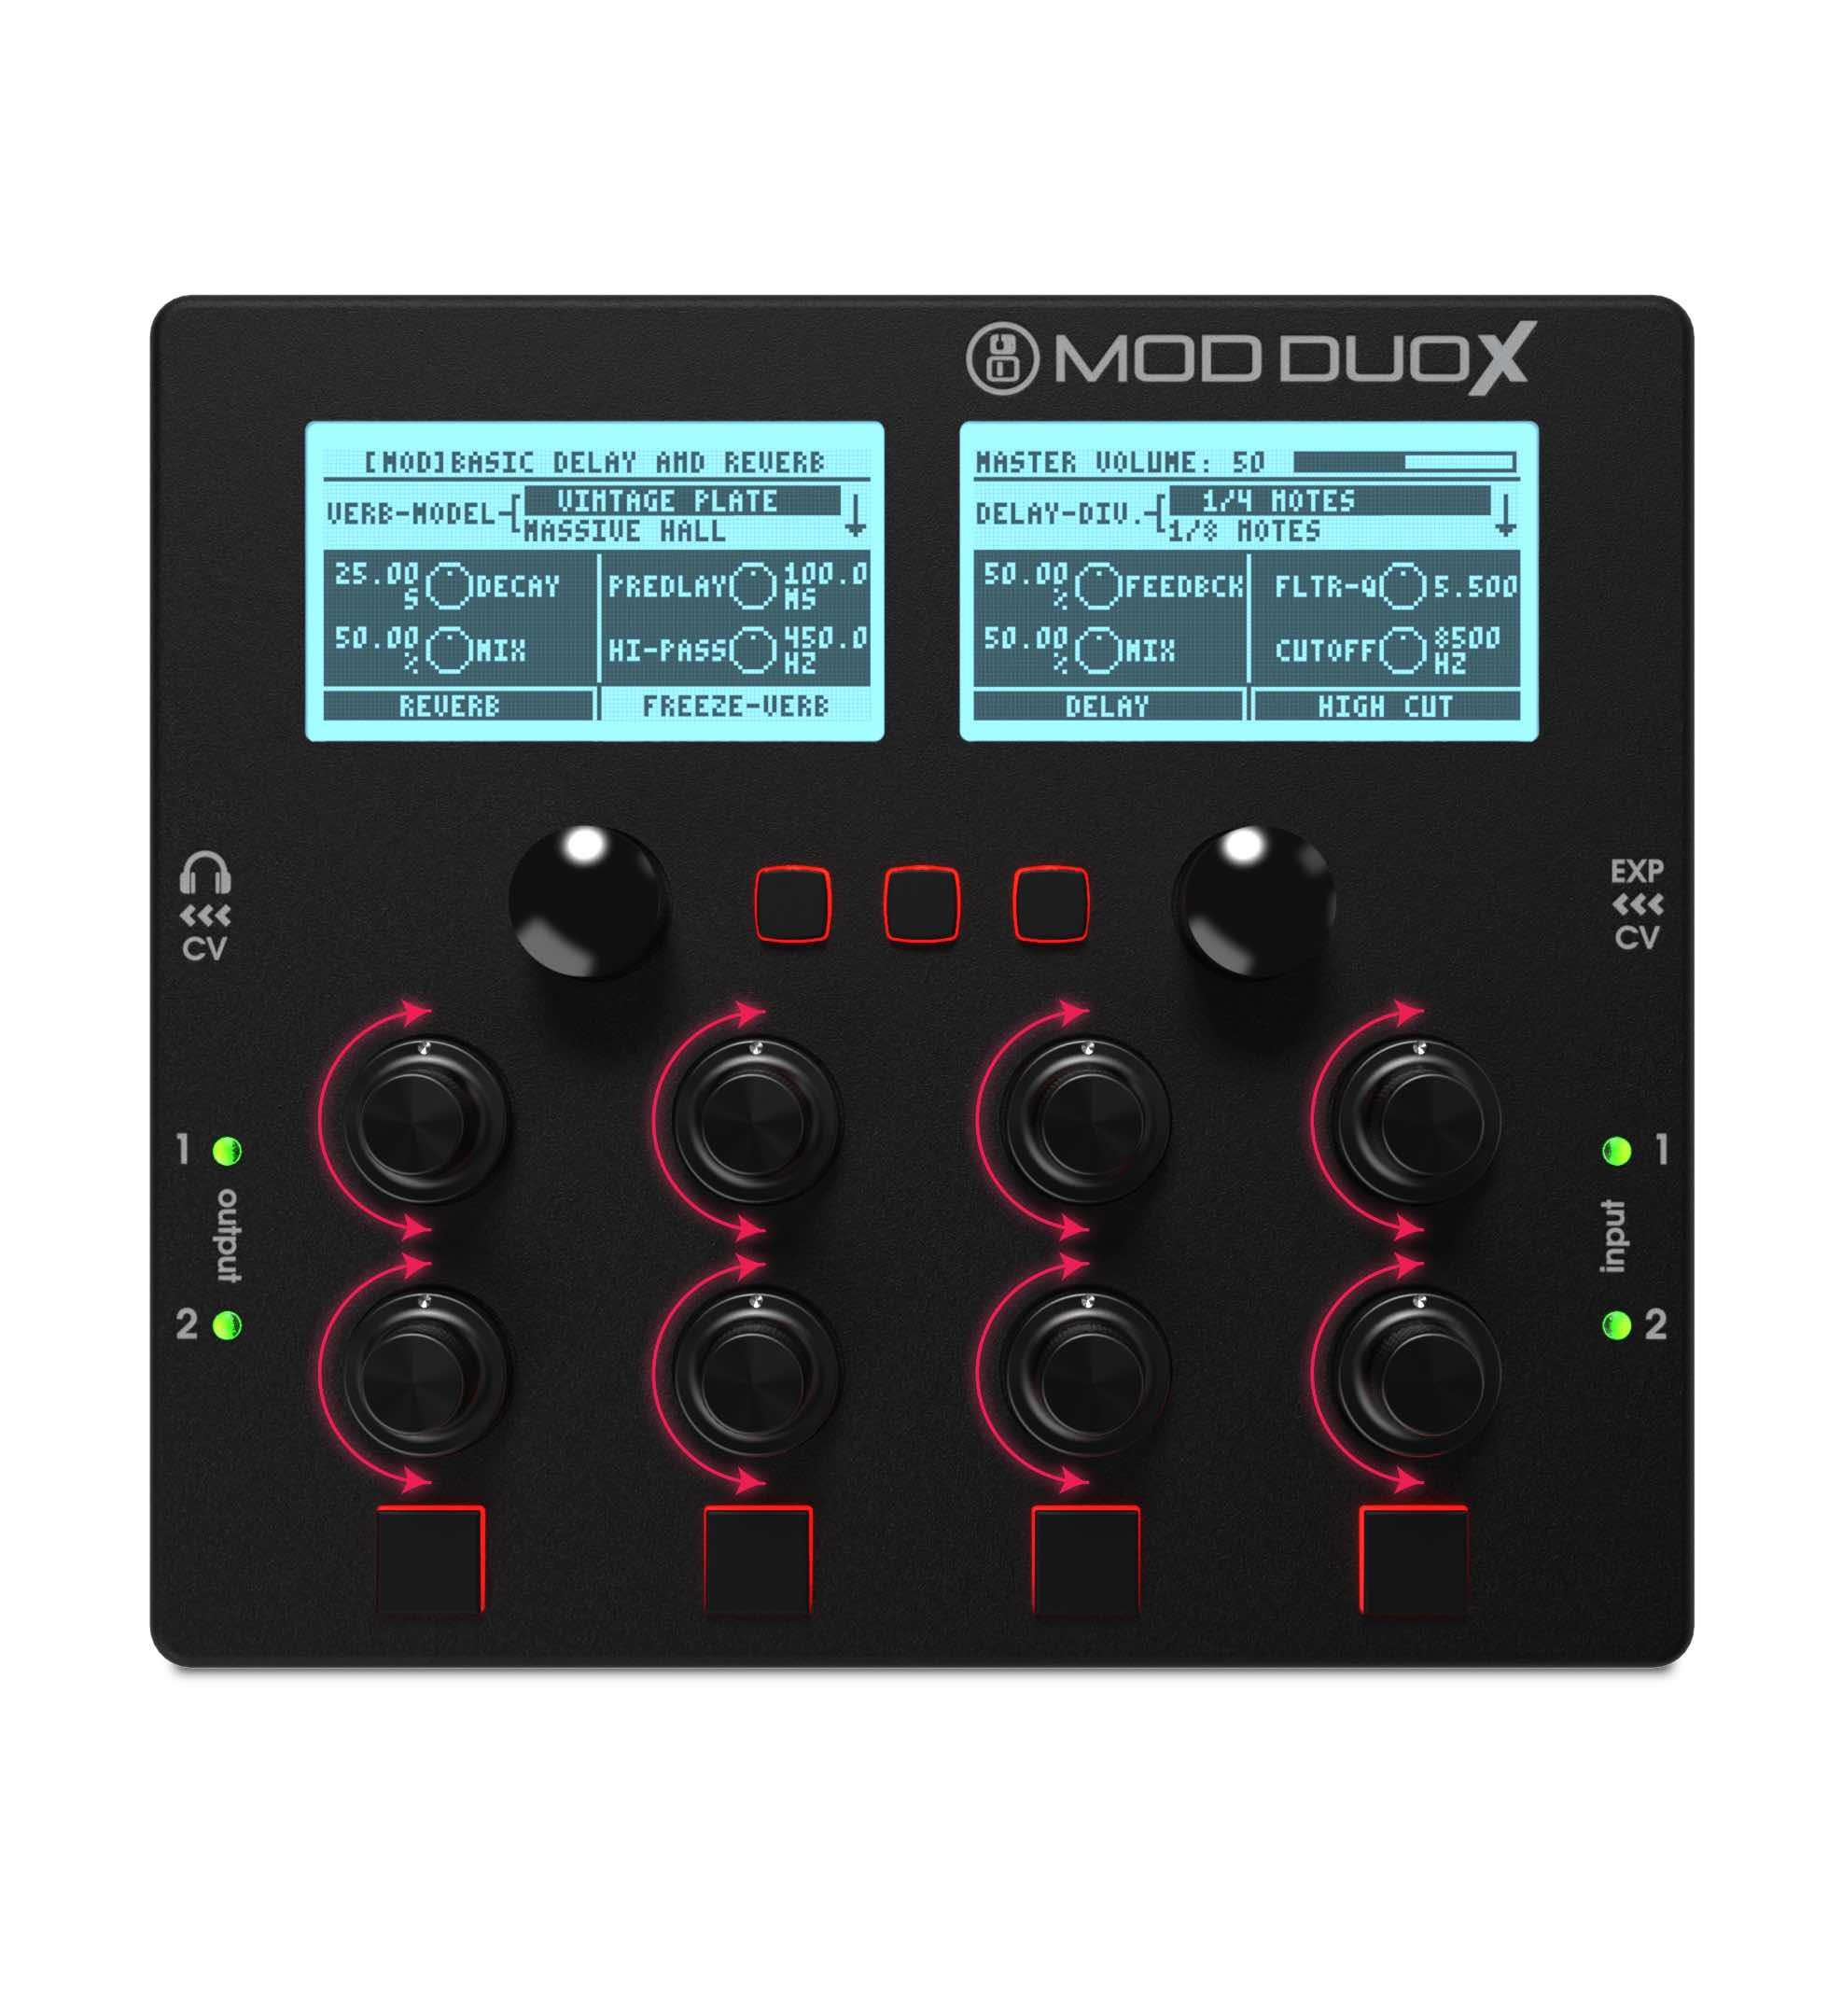 mod devices Mod Duo X controller produzione production music dj djing studio live strumenti musicali